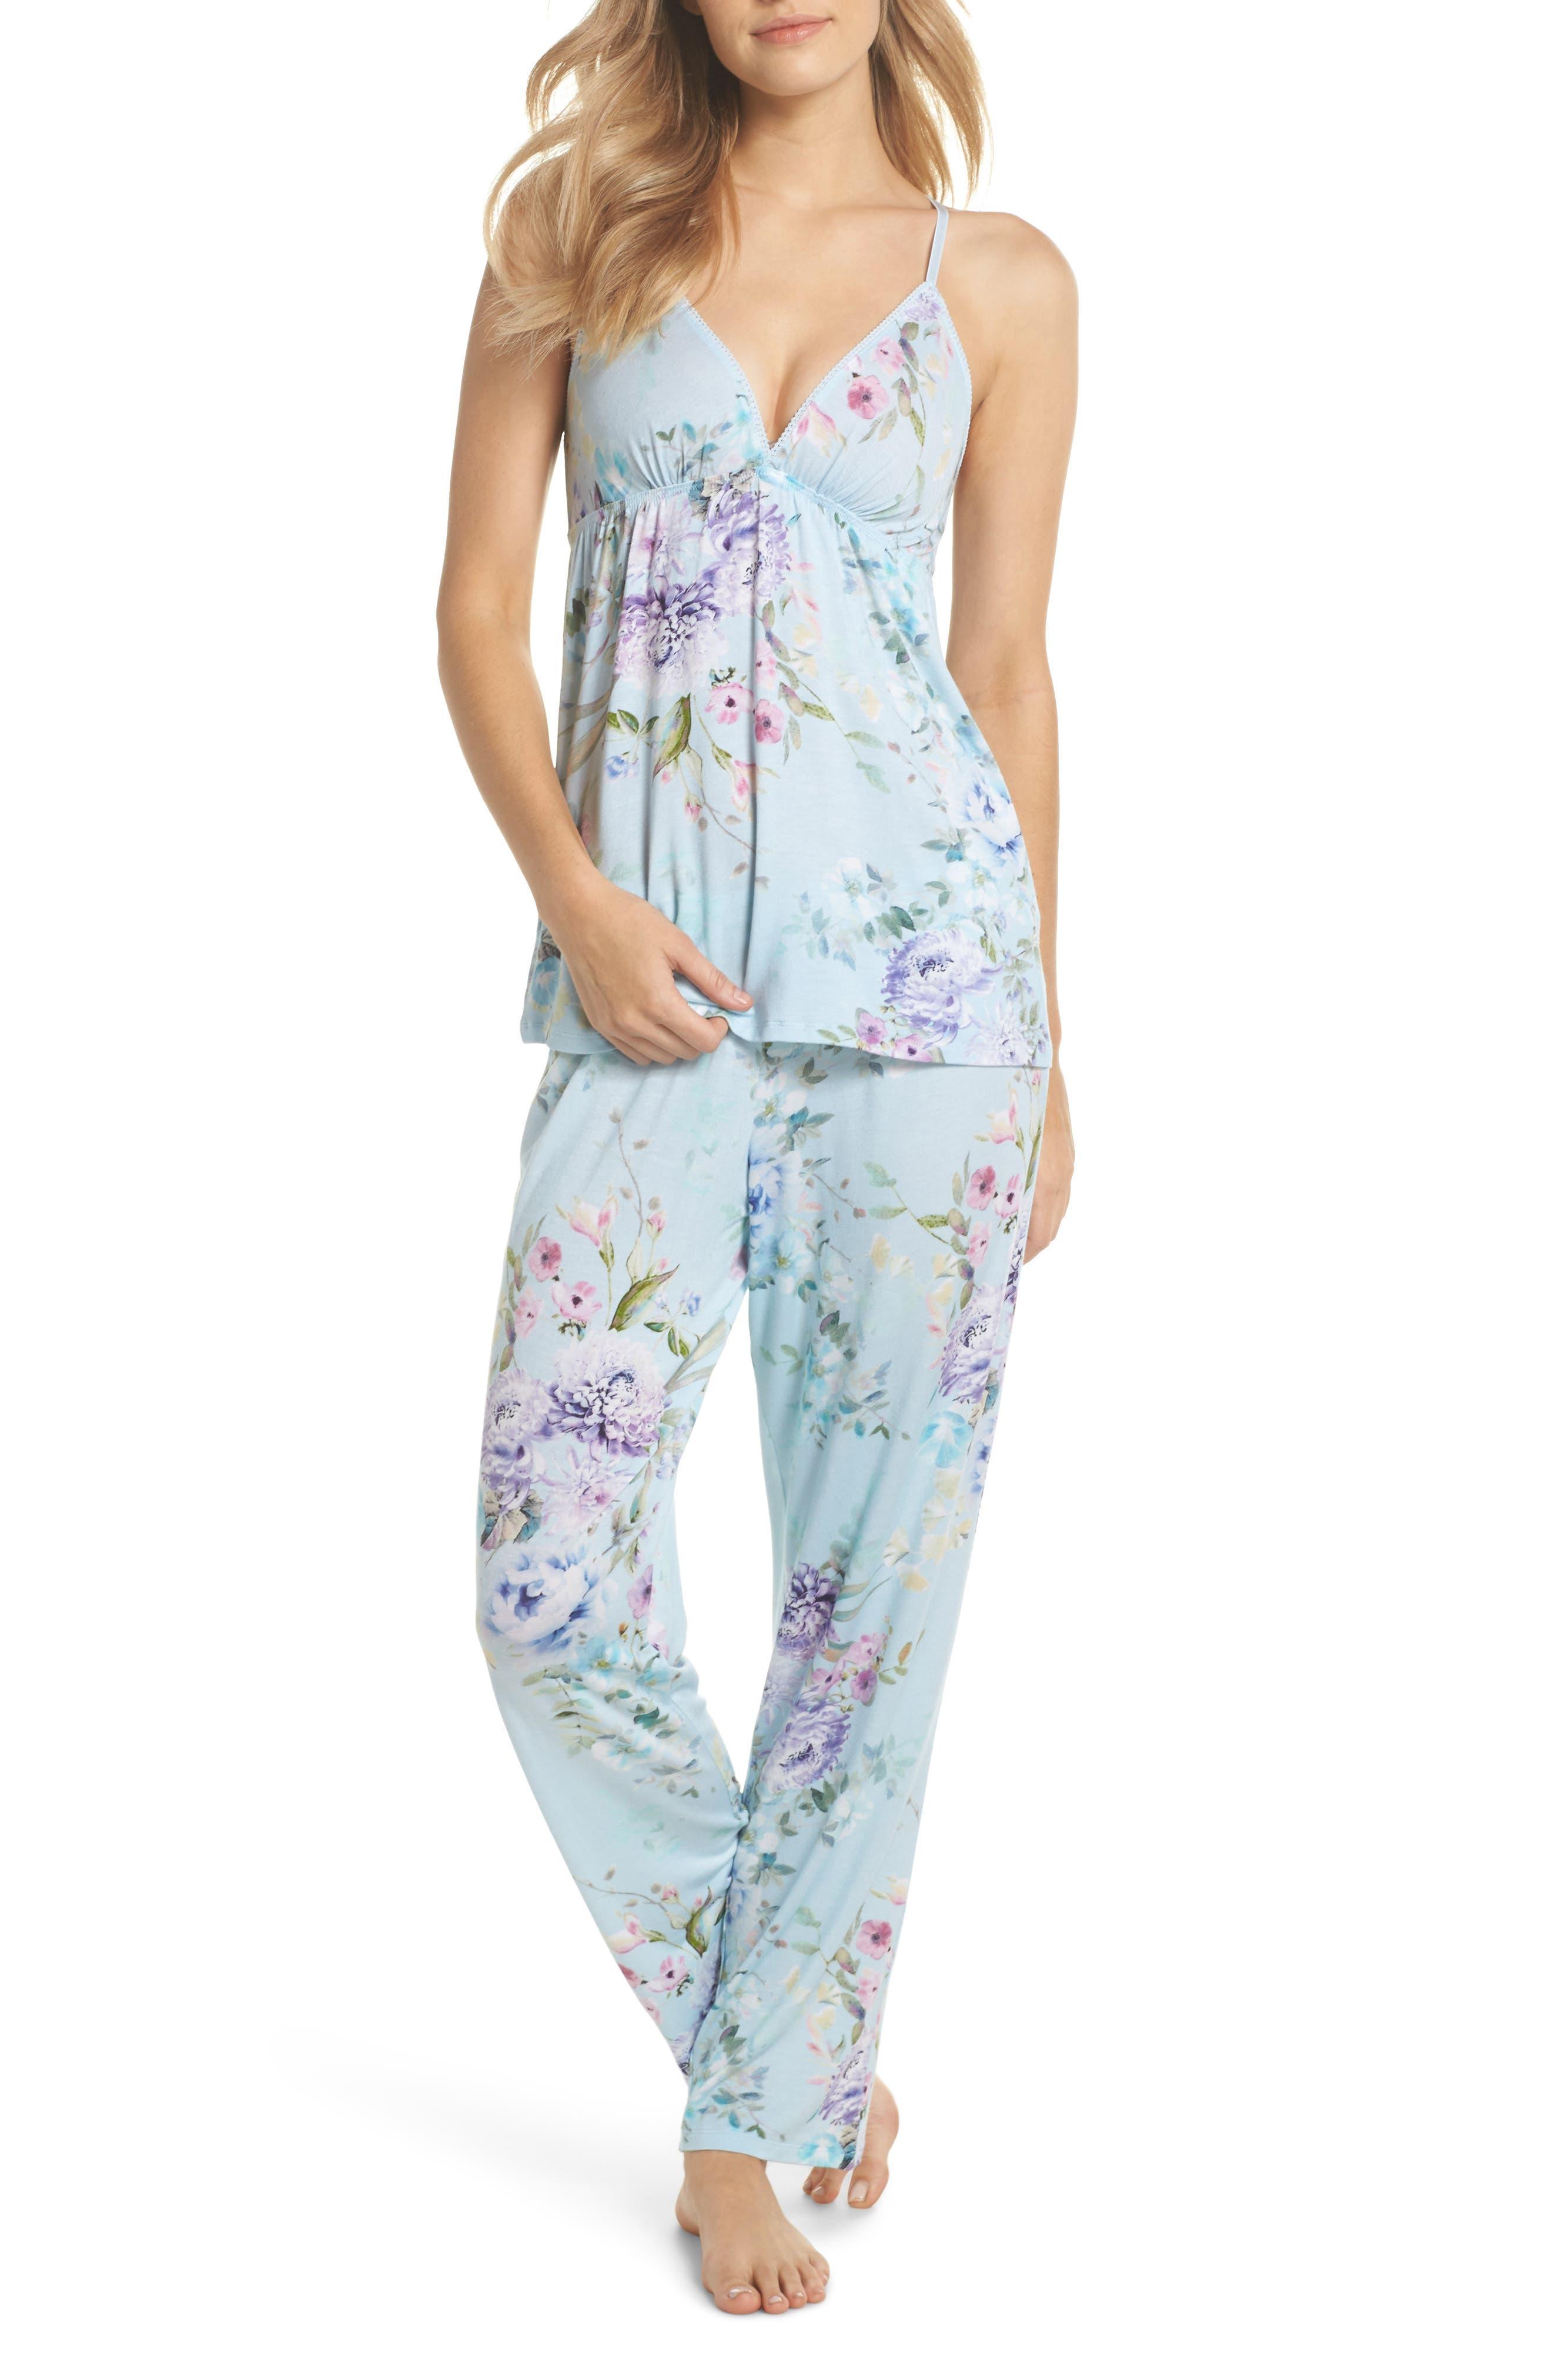 Aviva Pajamas,                             Main thumbnail 1, color,                             400